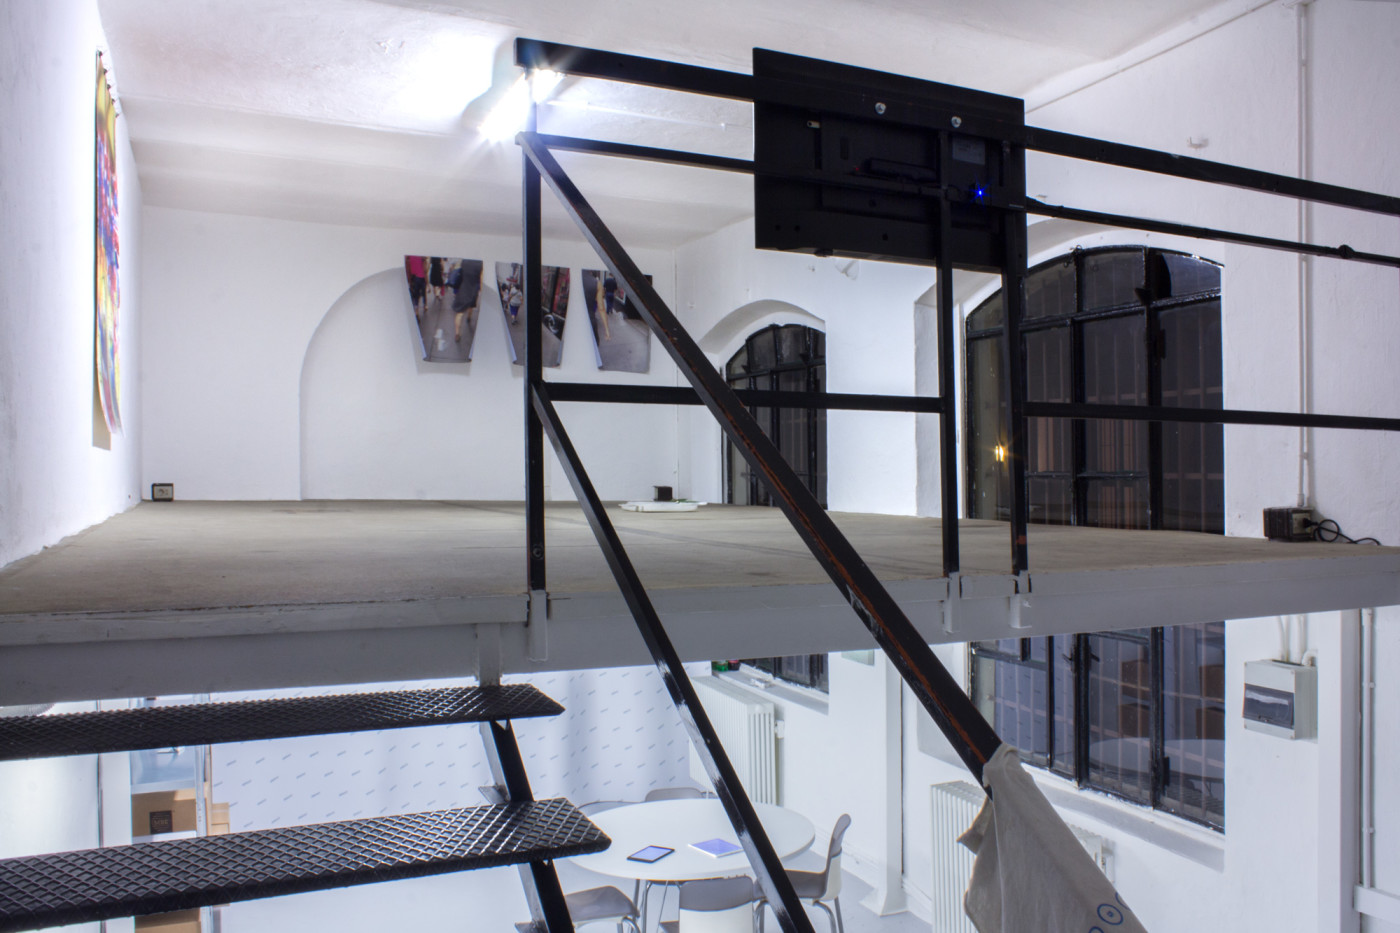 bb5000studio_corazon_installation_view_3